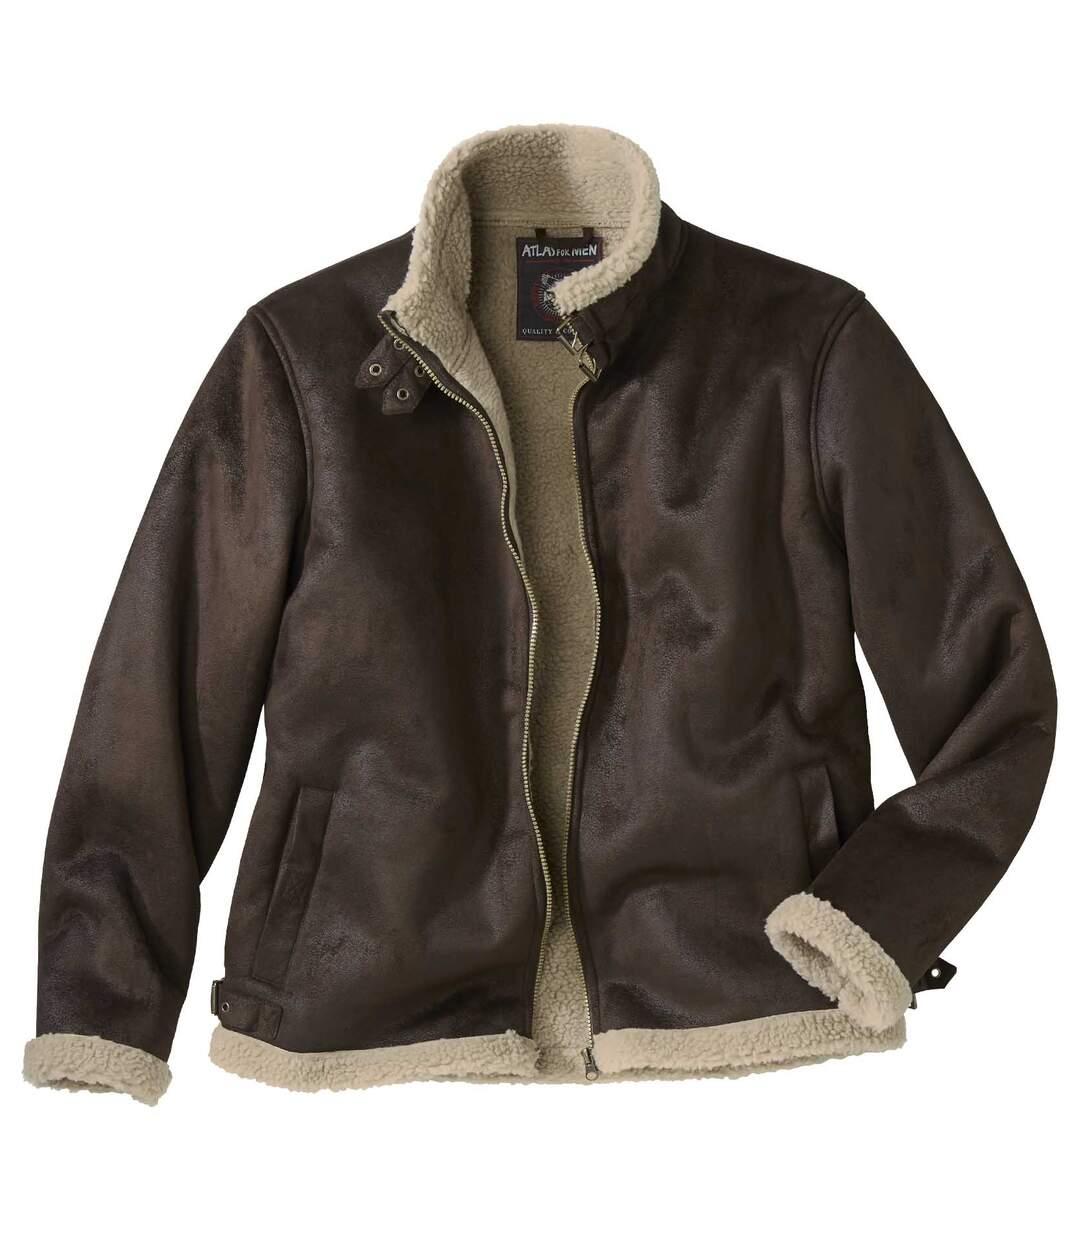 Men's Dark Brown Sherpa-Lined Faux-Suede Jacket - Full Zip